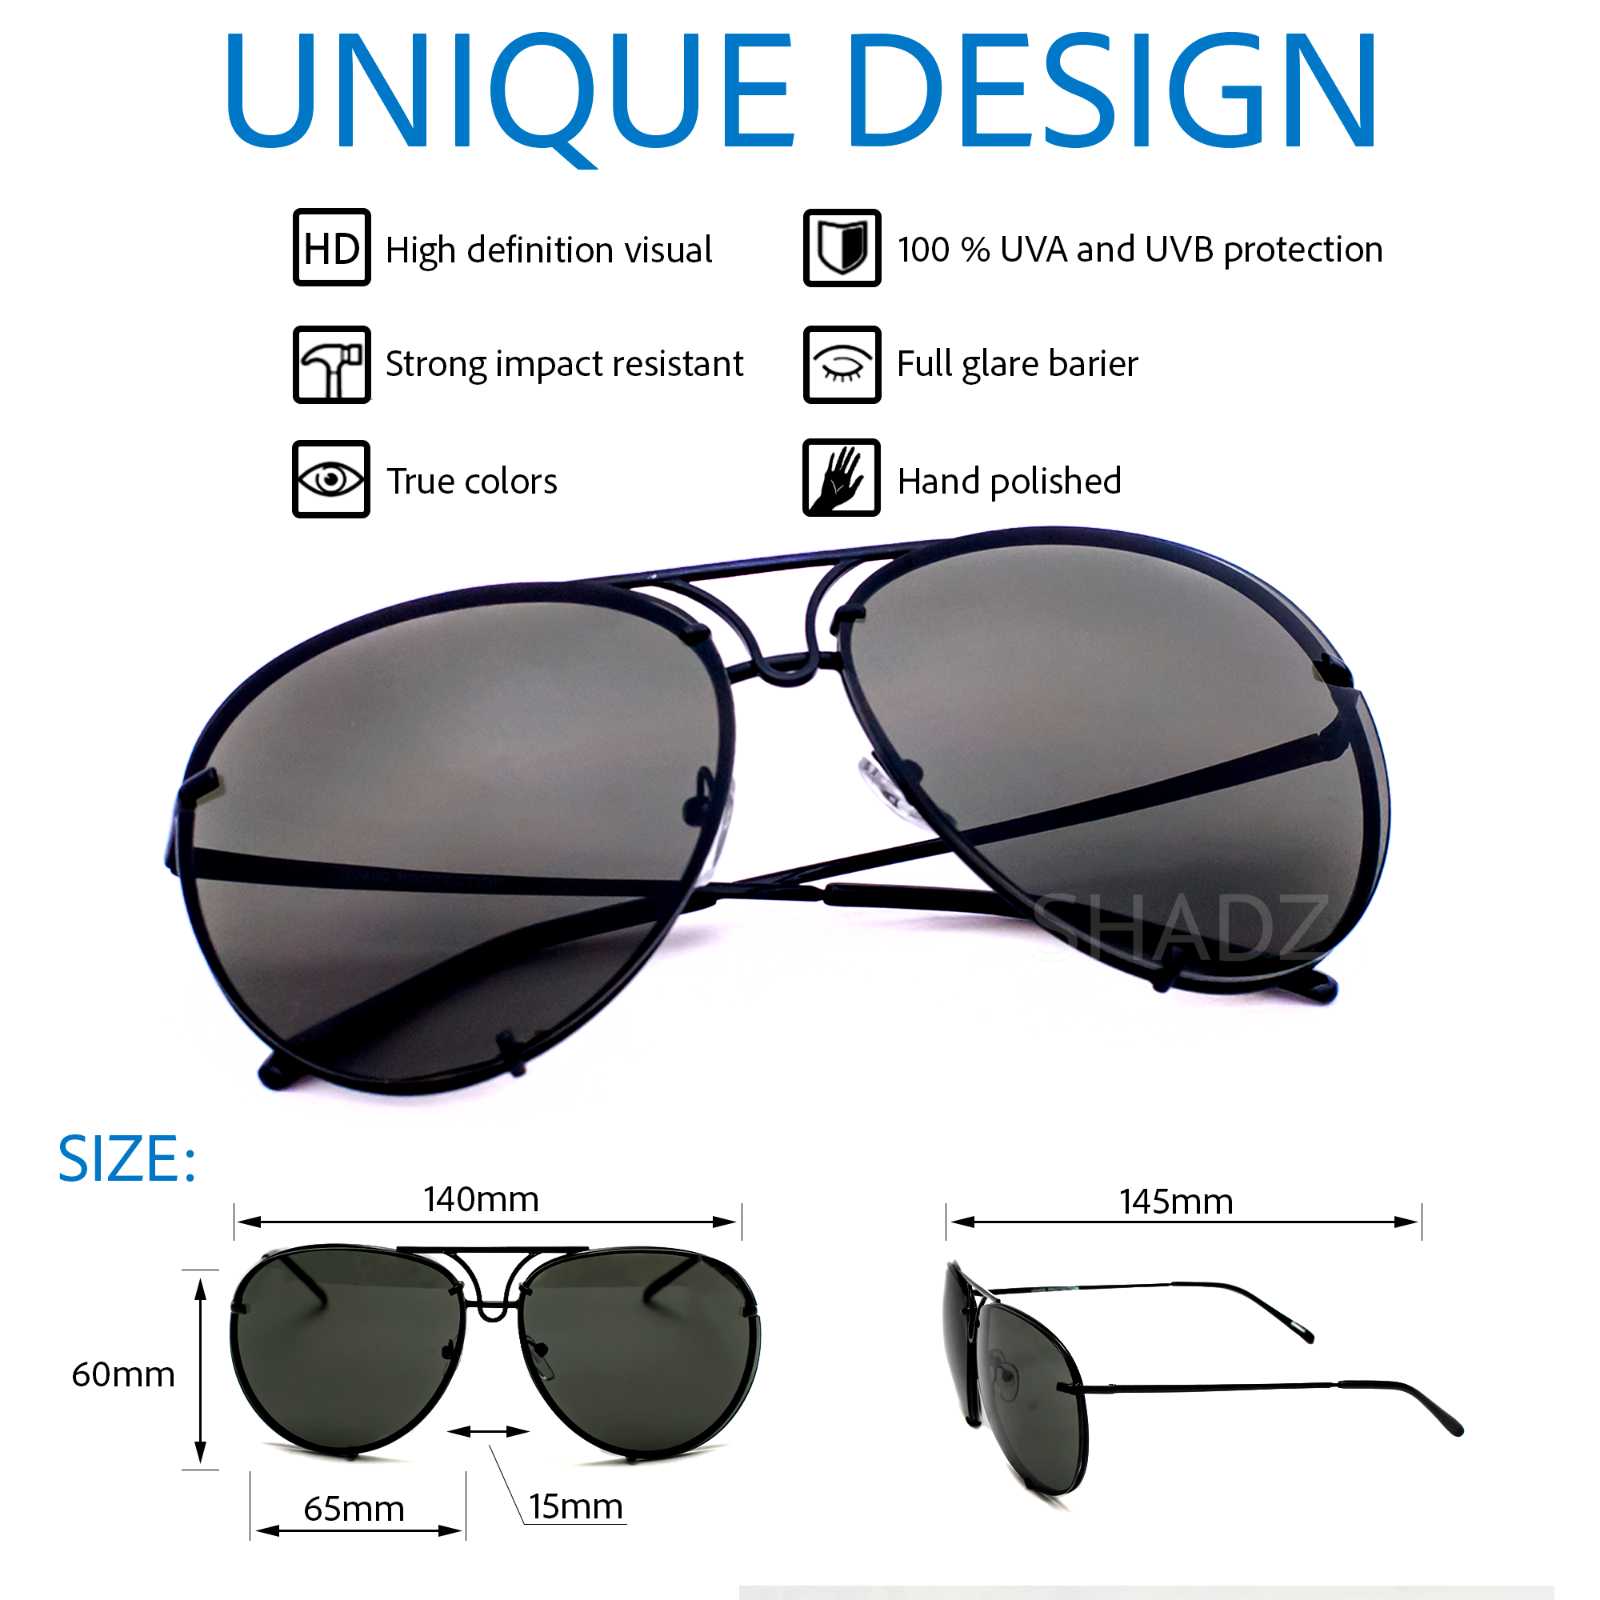 NEW XL Posche OVERSIZED Women Sunglasses Aviator Flat Top Square Shadz c